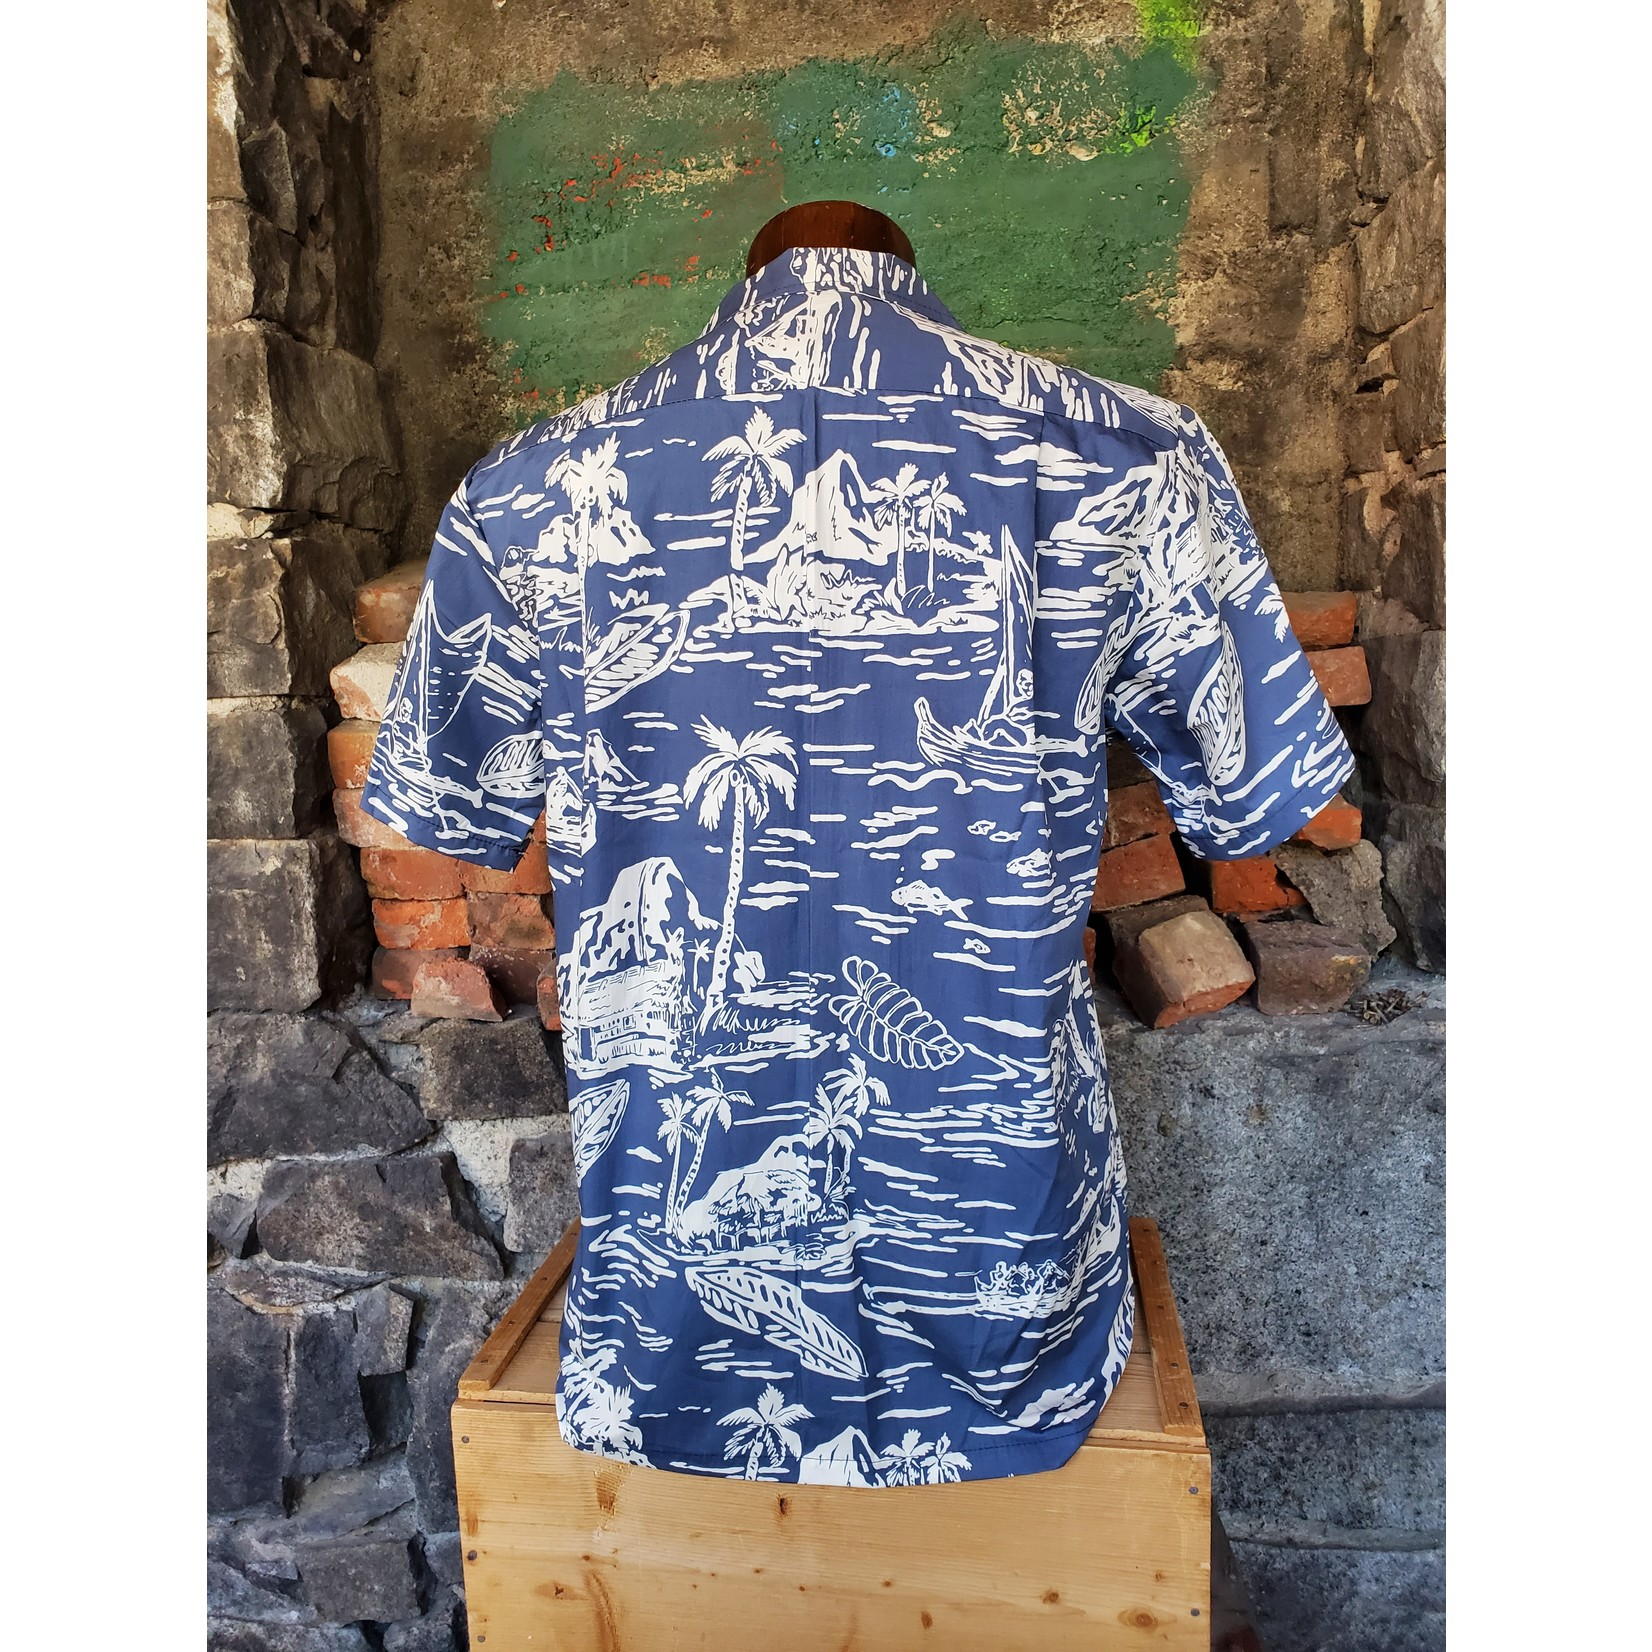 RJC Authentic Hawaiian Shirt - Impressionist Blue